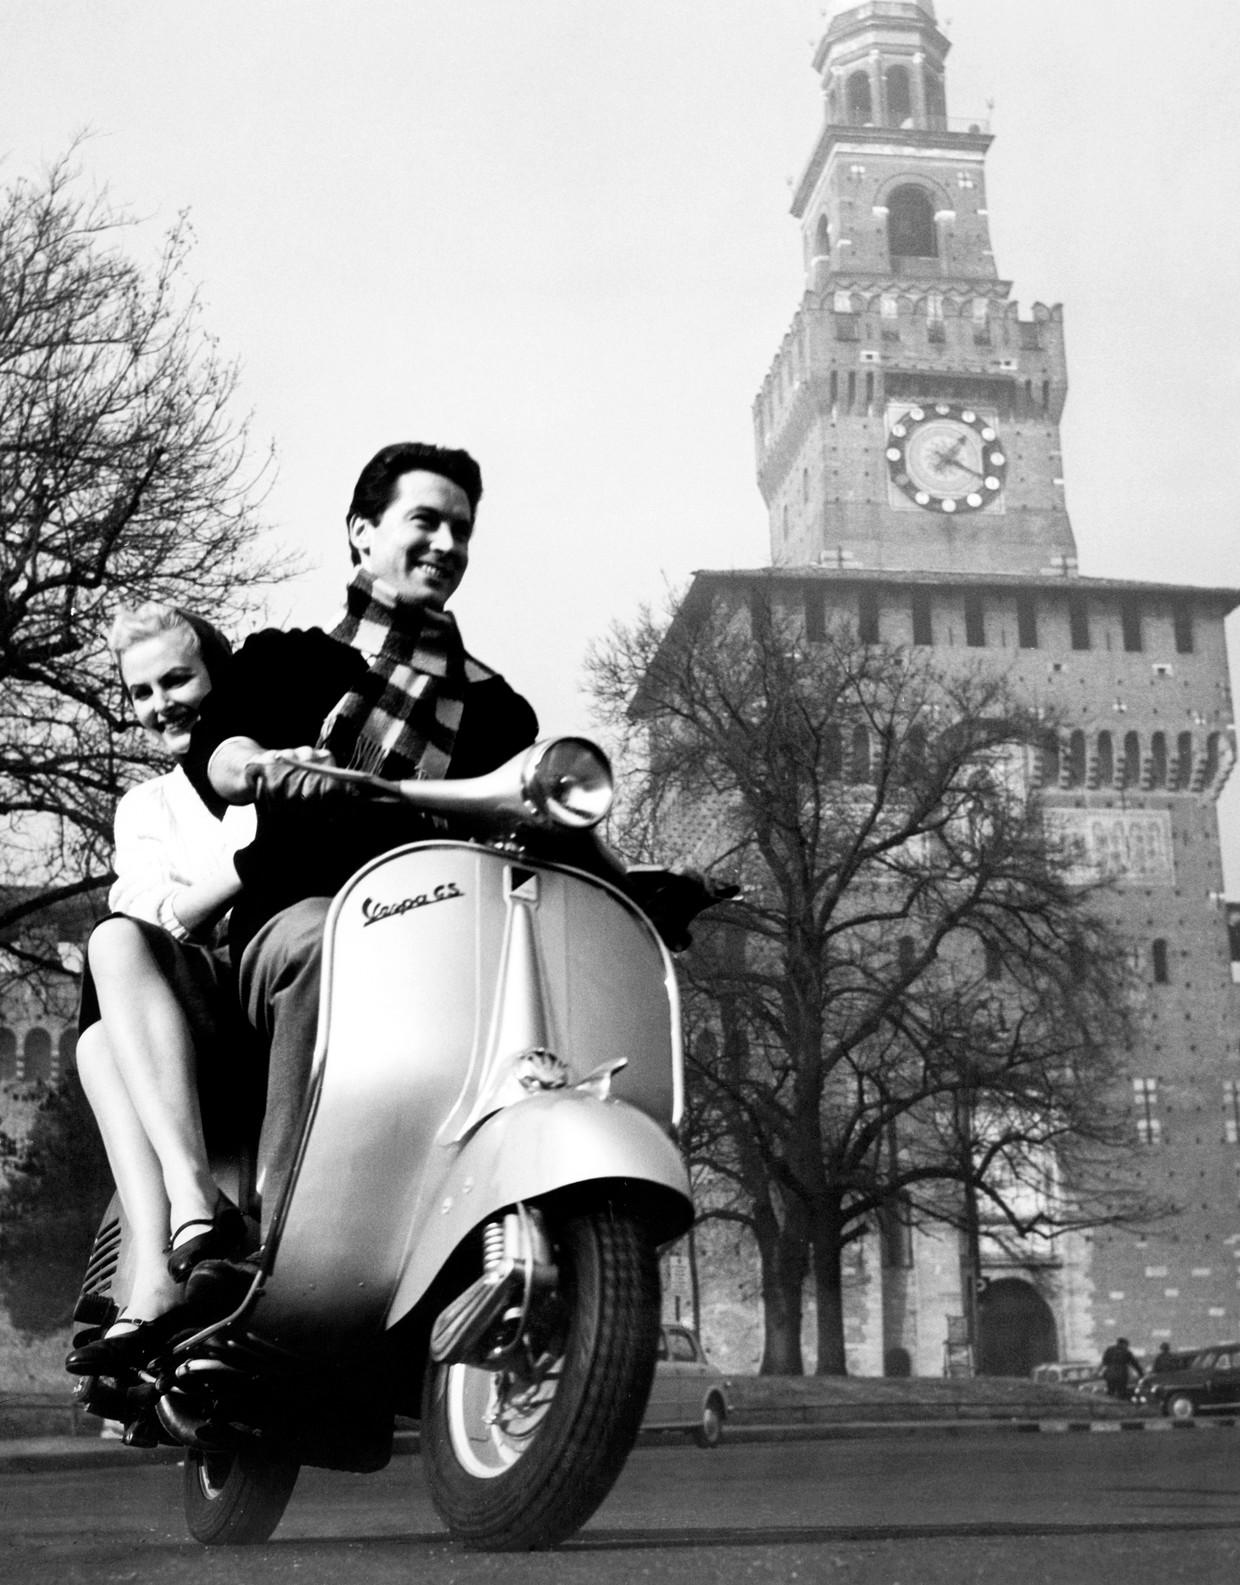 De Vespa bij het Castello Sforzesco in Milaan, in 1958. Beeld Touring Club Italiano/Marka/Univ